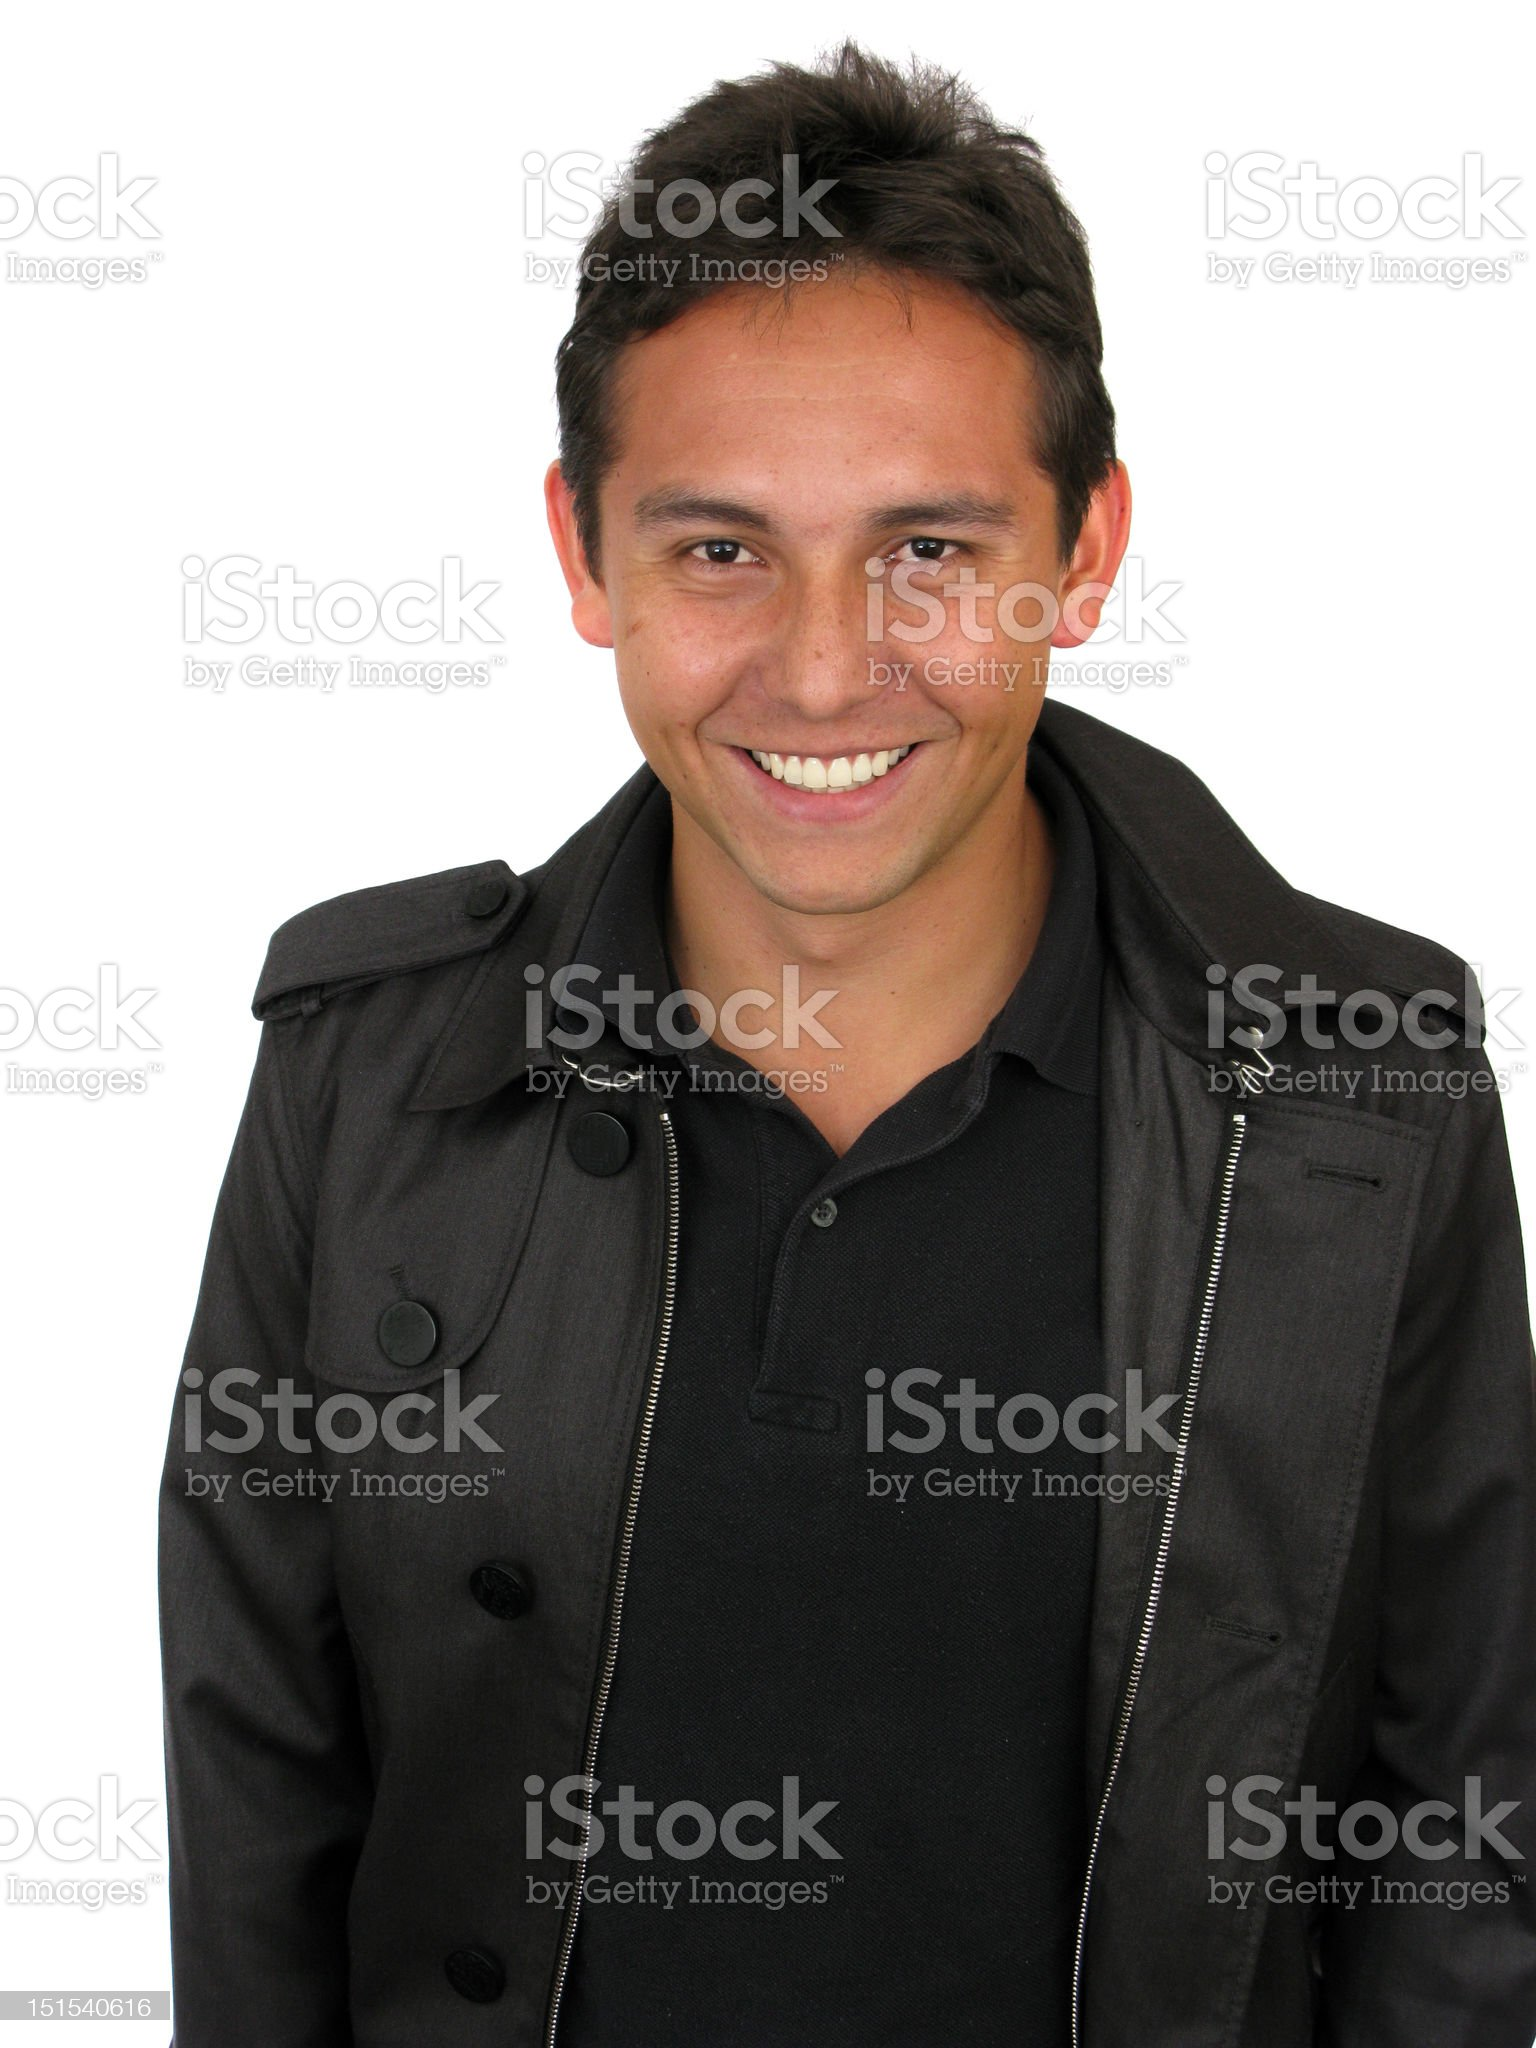 Casual Friendly Man royalty-free stock photo